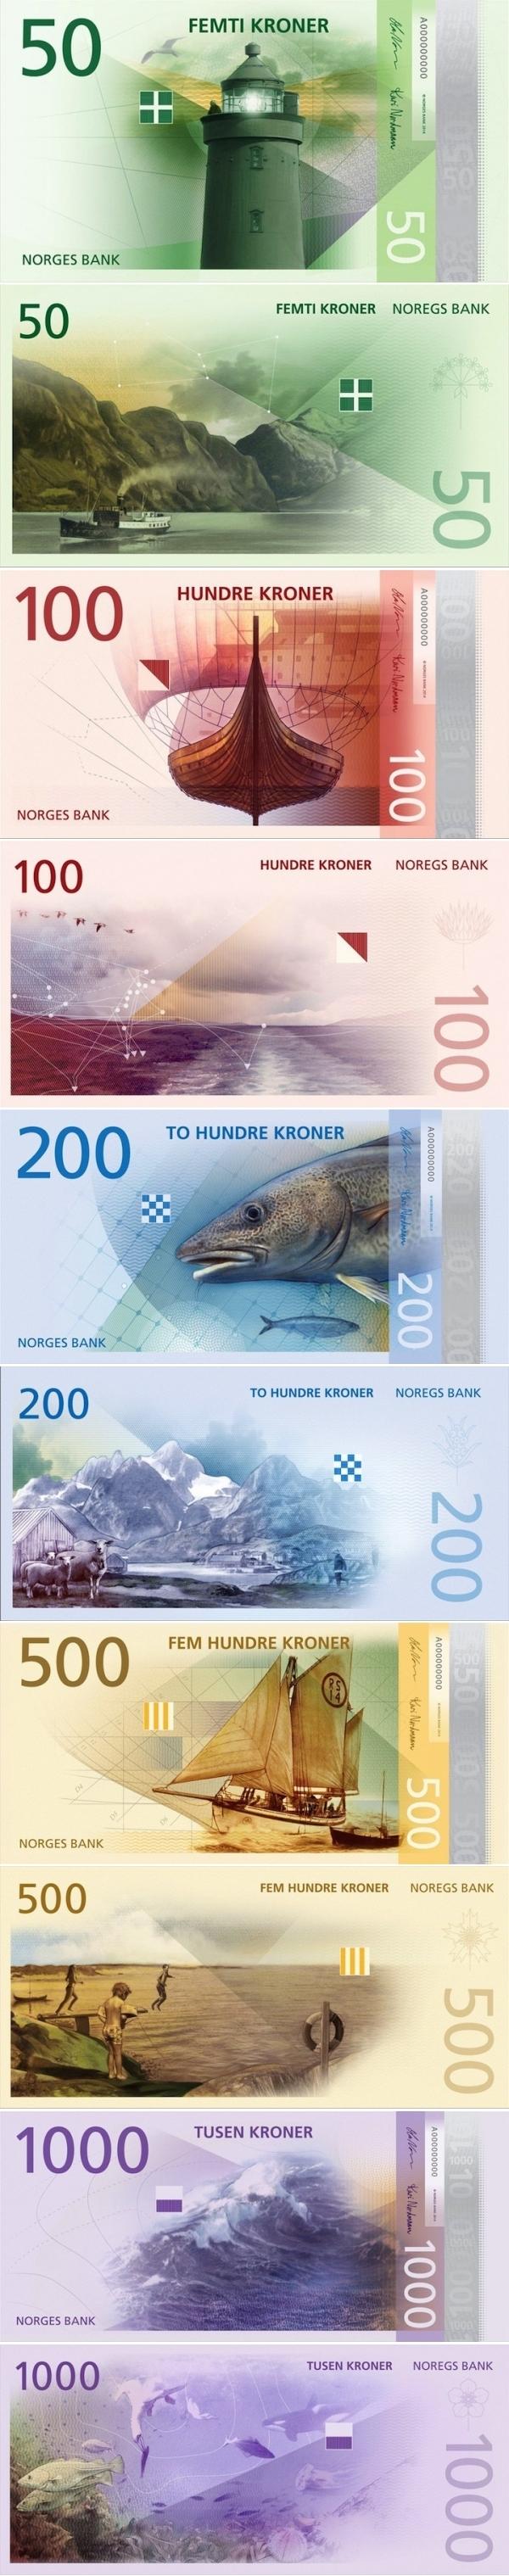 Norvegijos Kronos Nauji Banknotai Inter Travel Norway S New Banknotes Norwegen Reisebilder Skandinavien